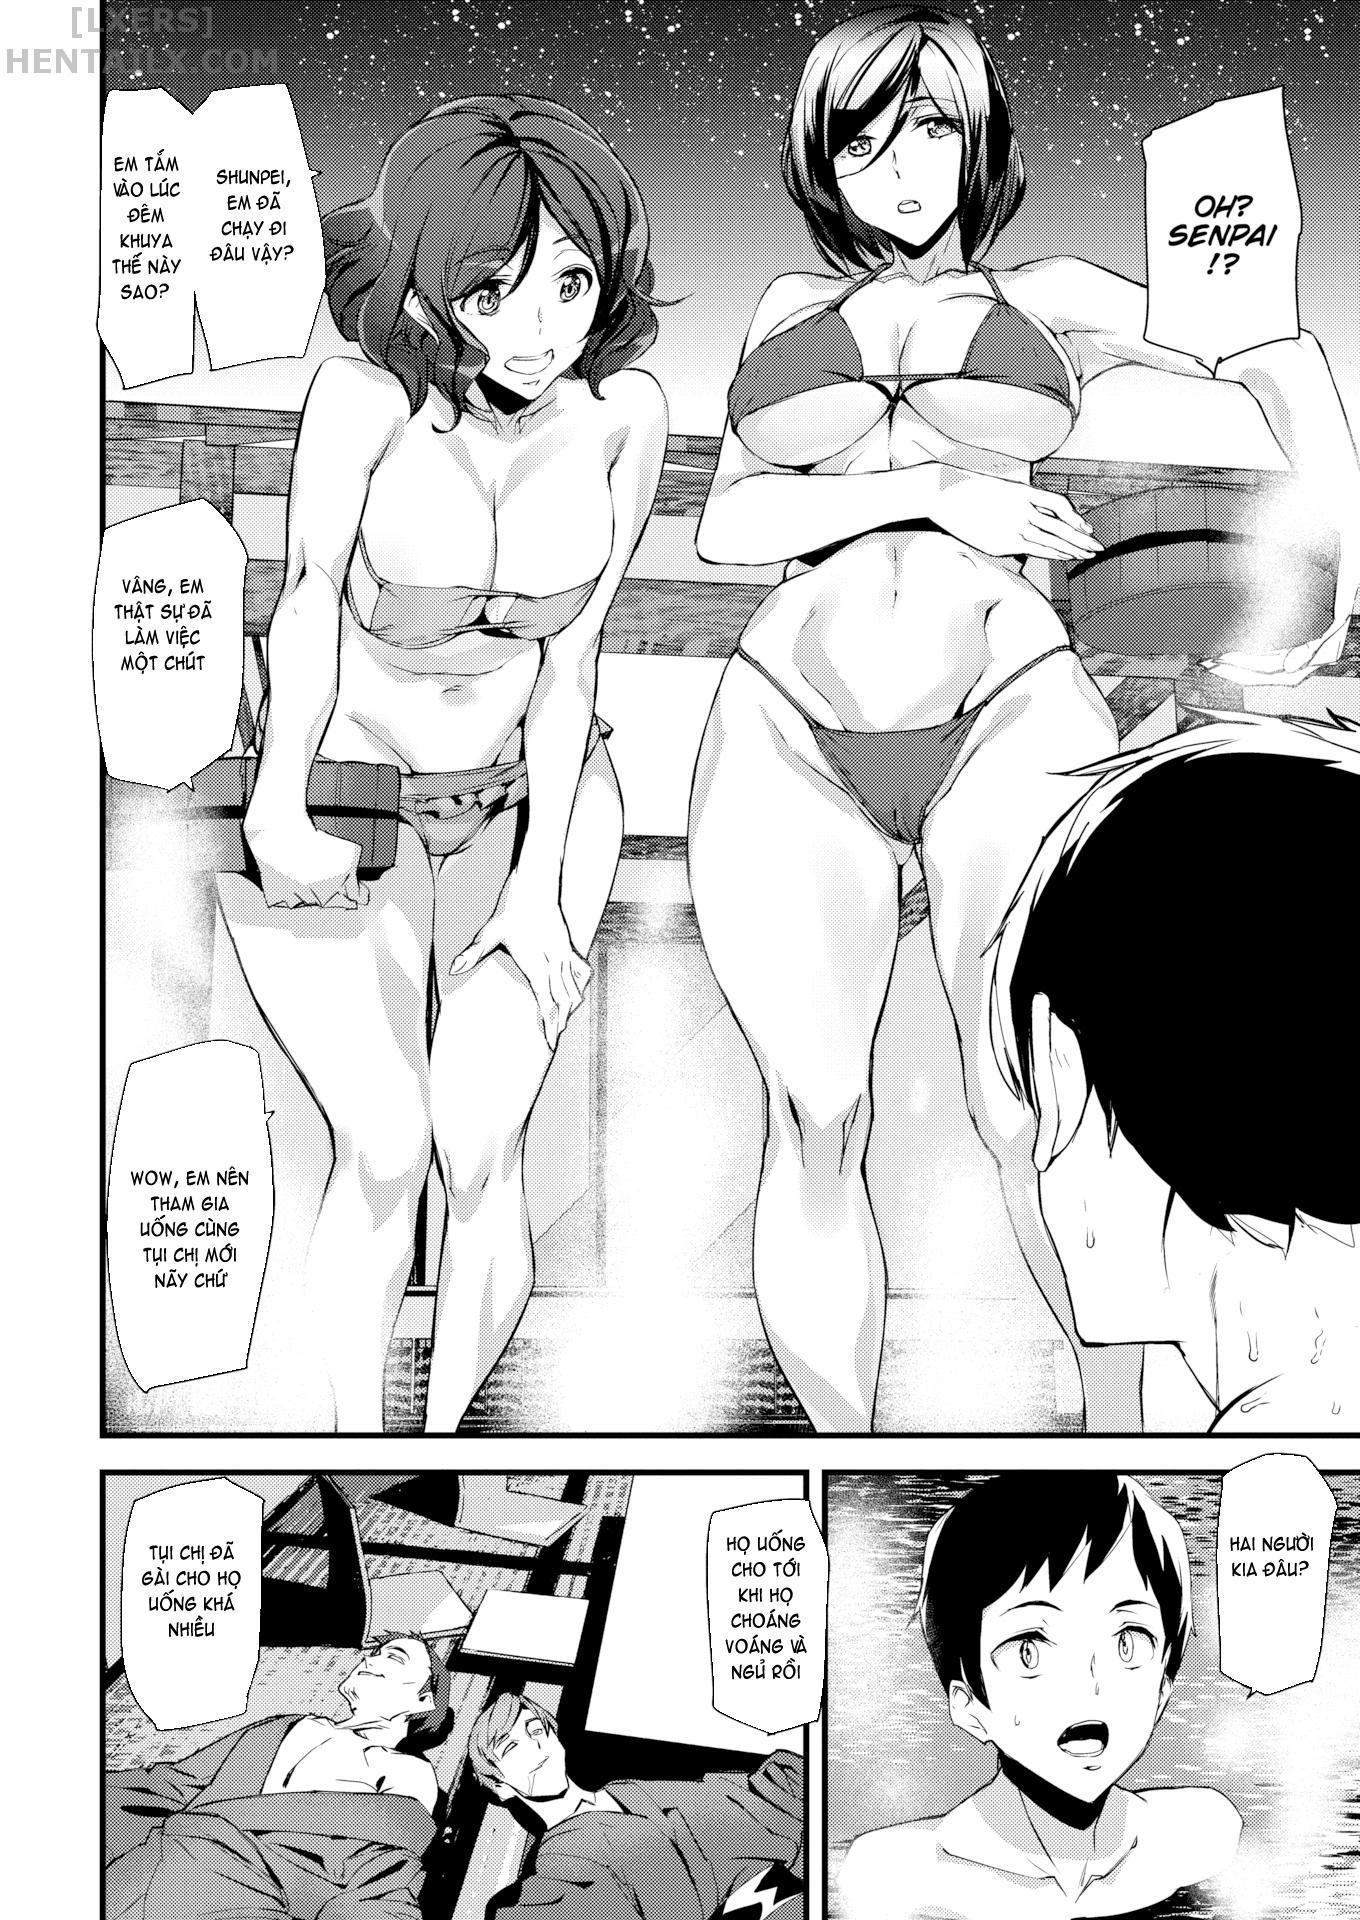 006 Hot Trip  - hentaicube.net - Truyện tranh hentai online